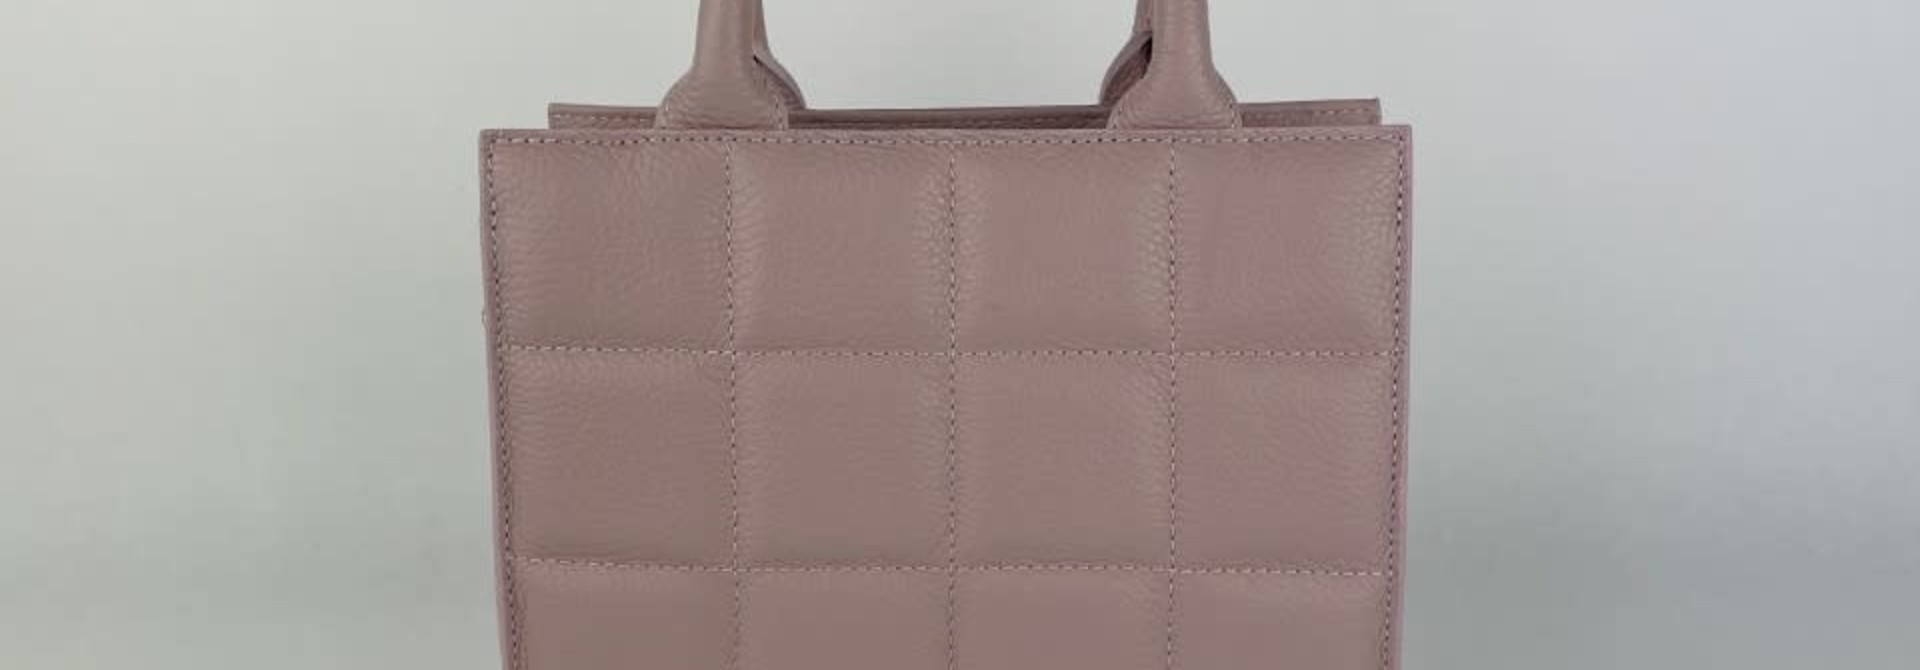 Metora leather bag  Lila